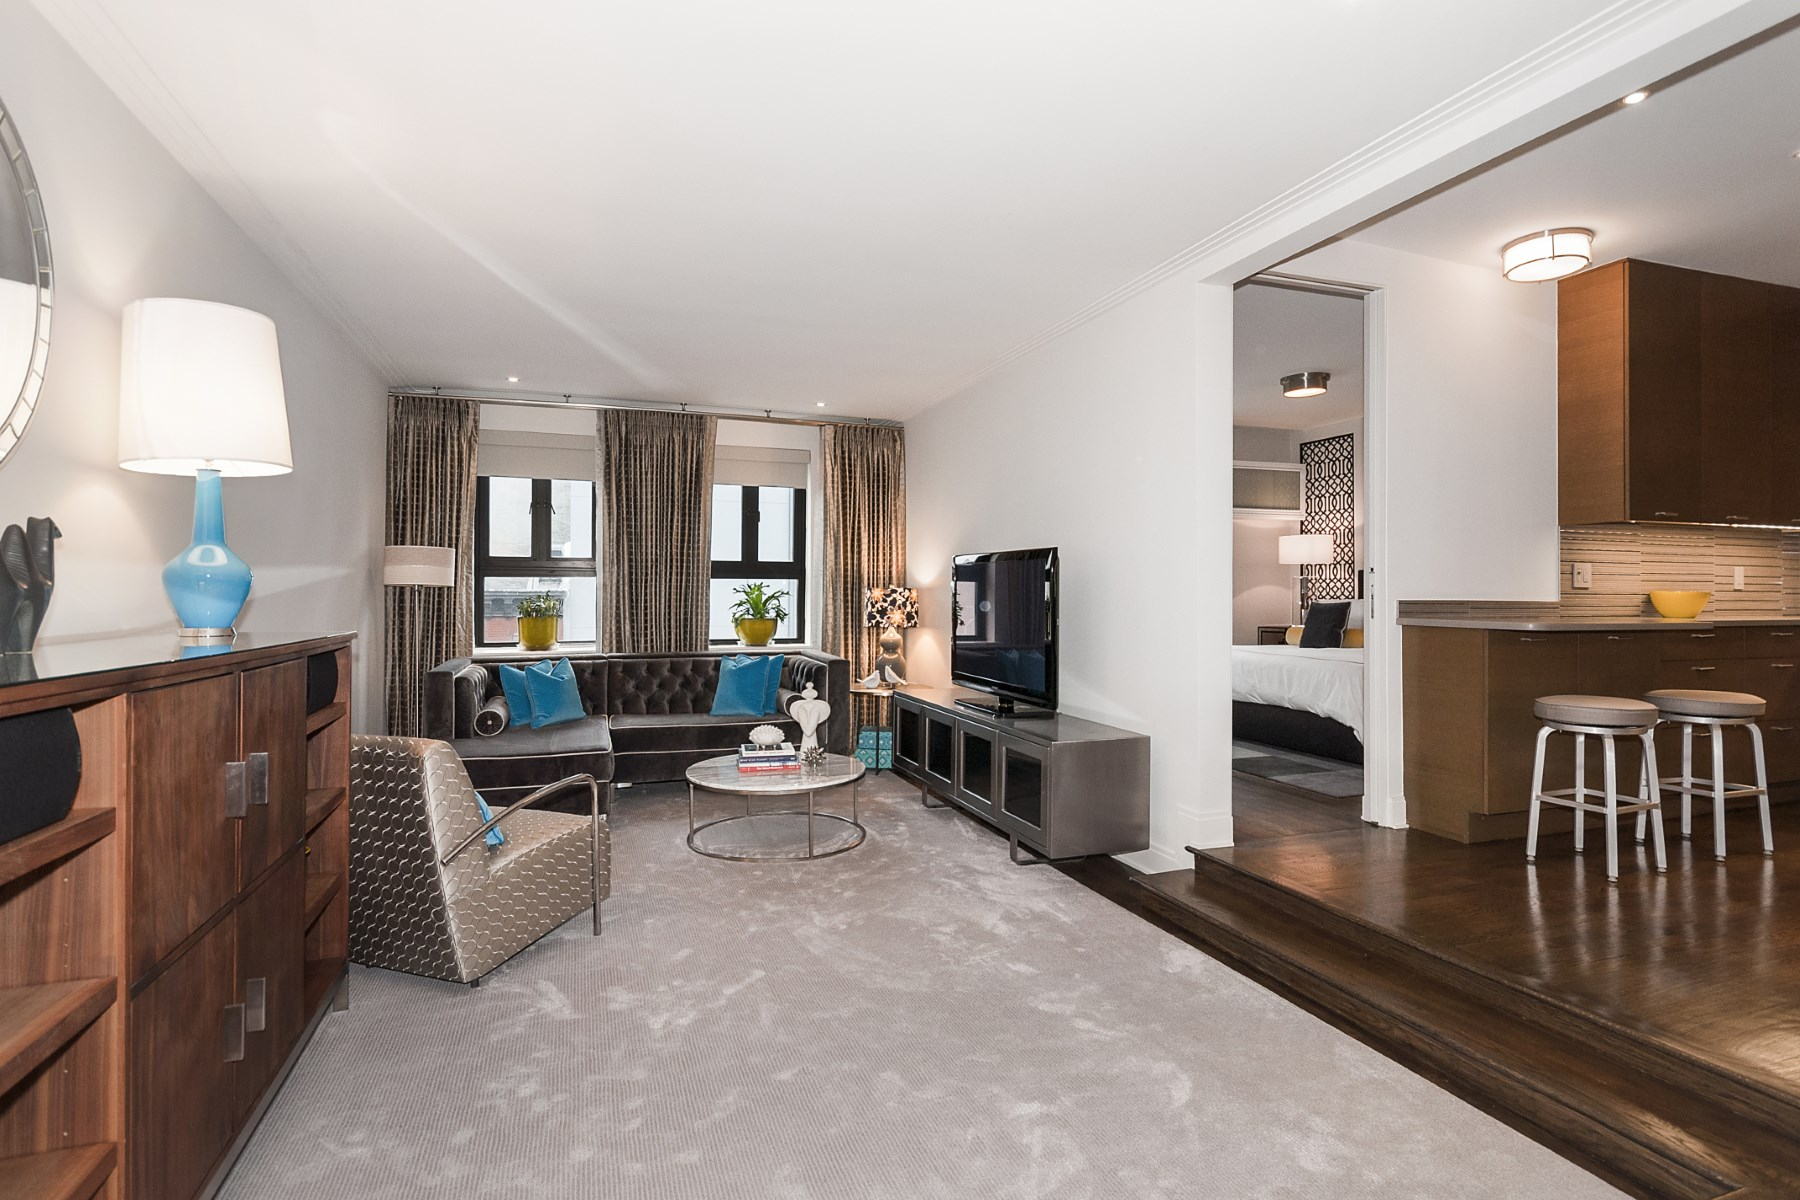 Кооперативная квартира для того Продажа на 255 West 23rd Street, Apt 5HW 255 West 23rd Street Apt 5HW Chelsea, New York, Нью-Йорк, 10011 Соединенные Штаты